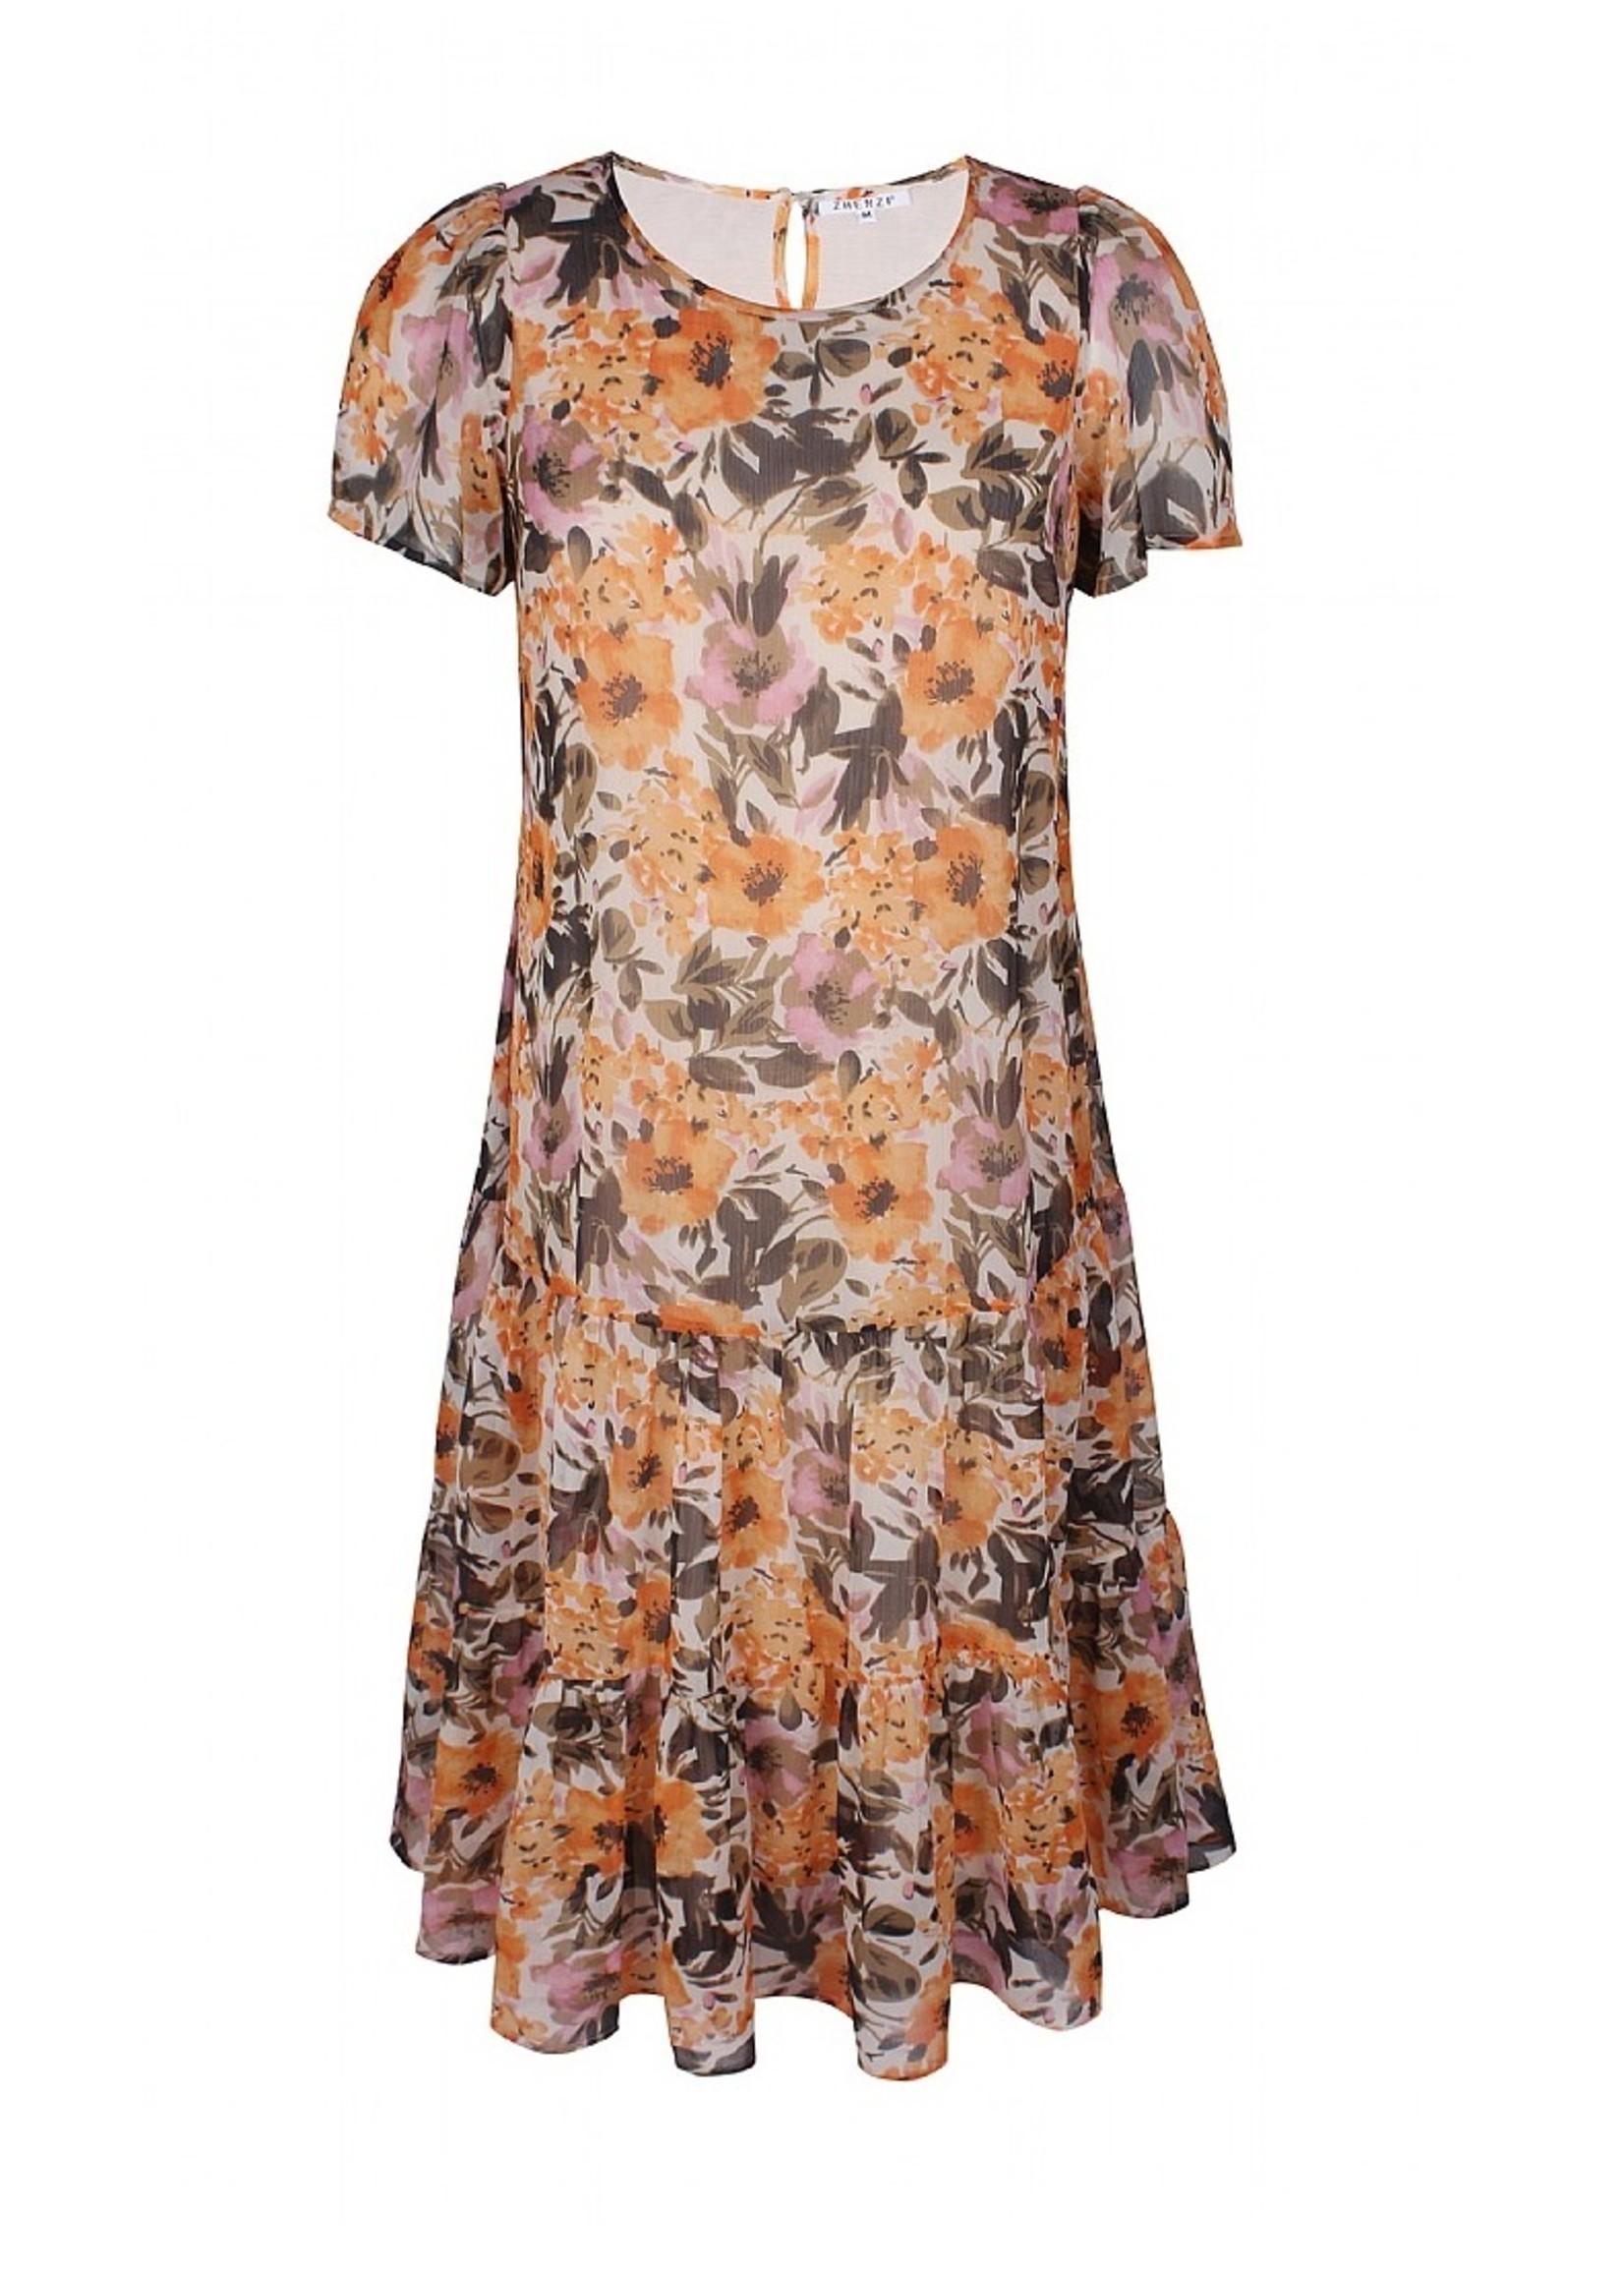 Zhenzi Zhenzi Fern Flower Dress